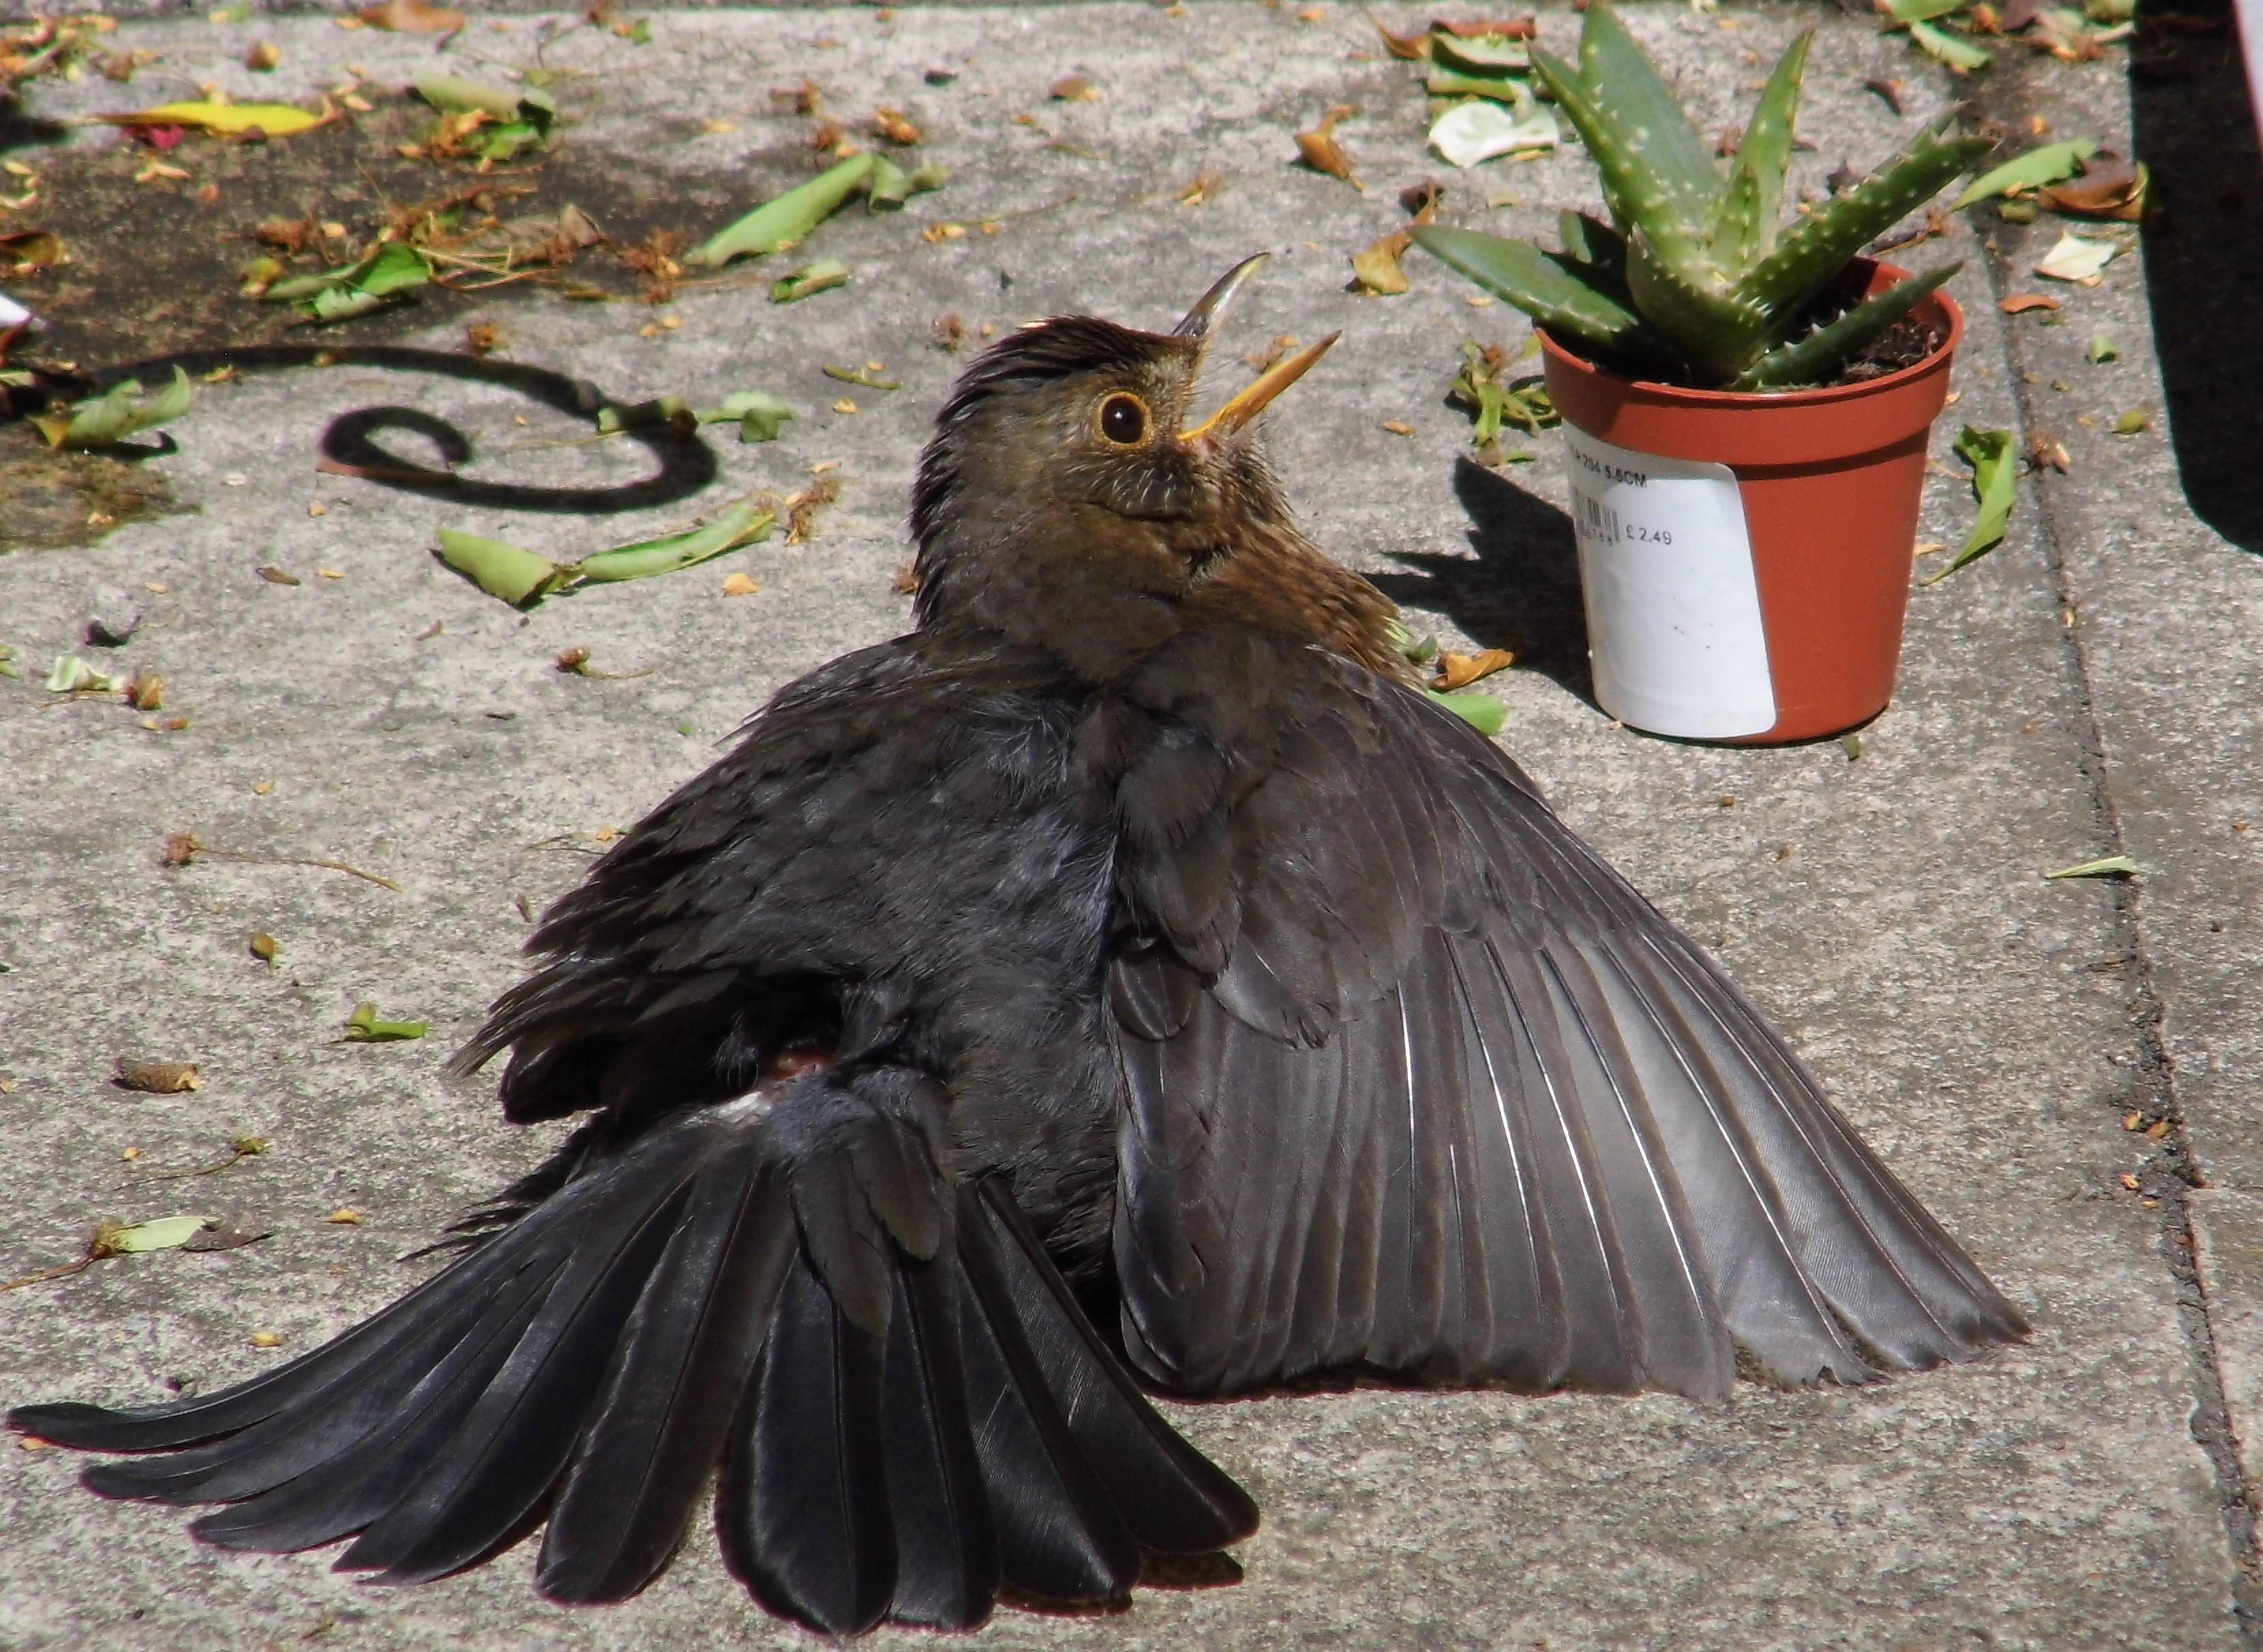 Blackbird by Chris Morris